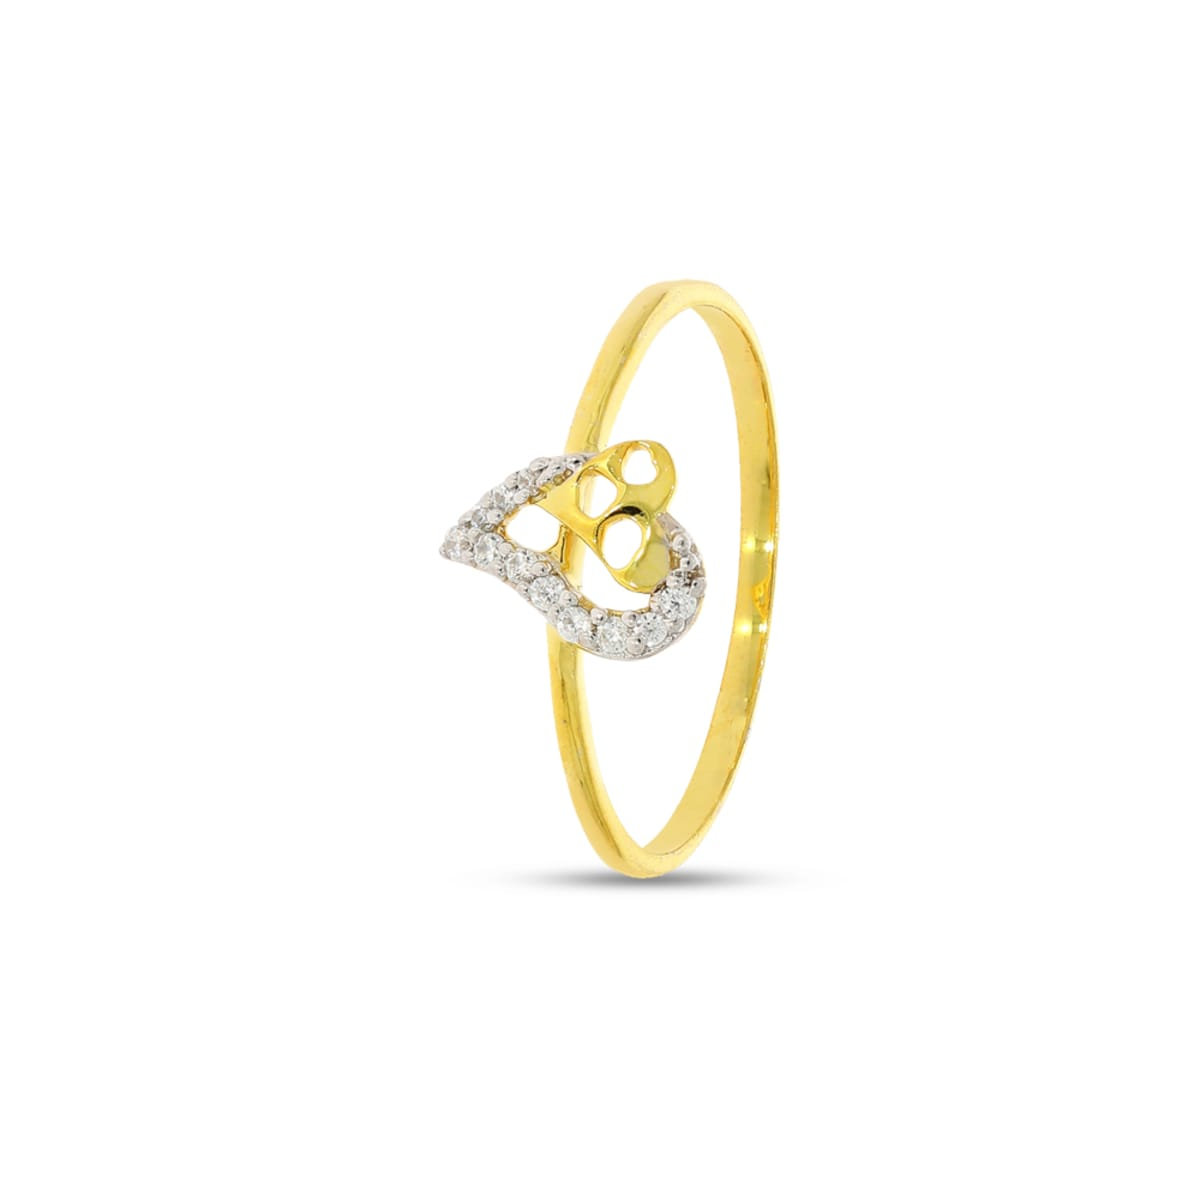 Heart Shape With 11 Pcs Diamond Ring